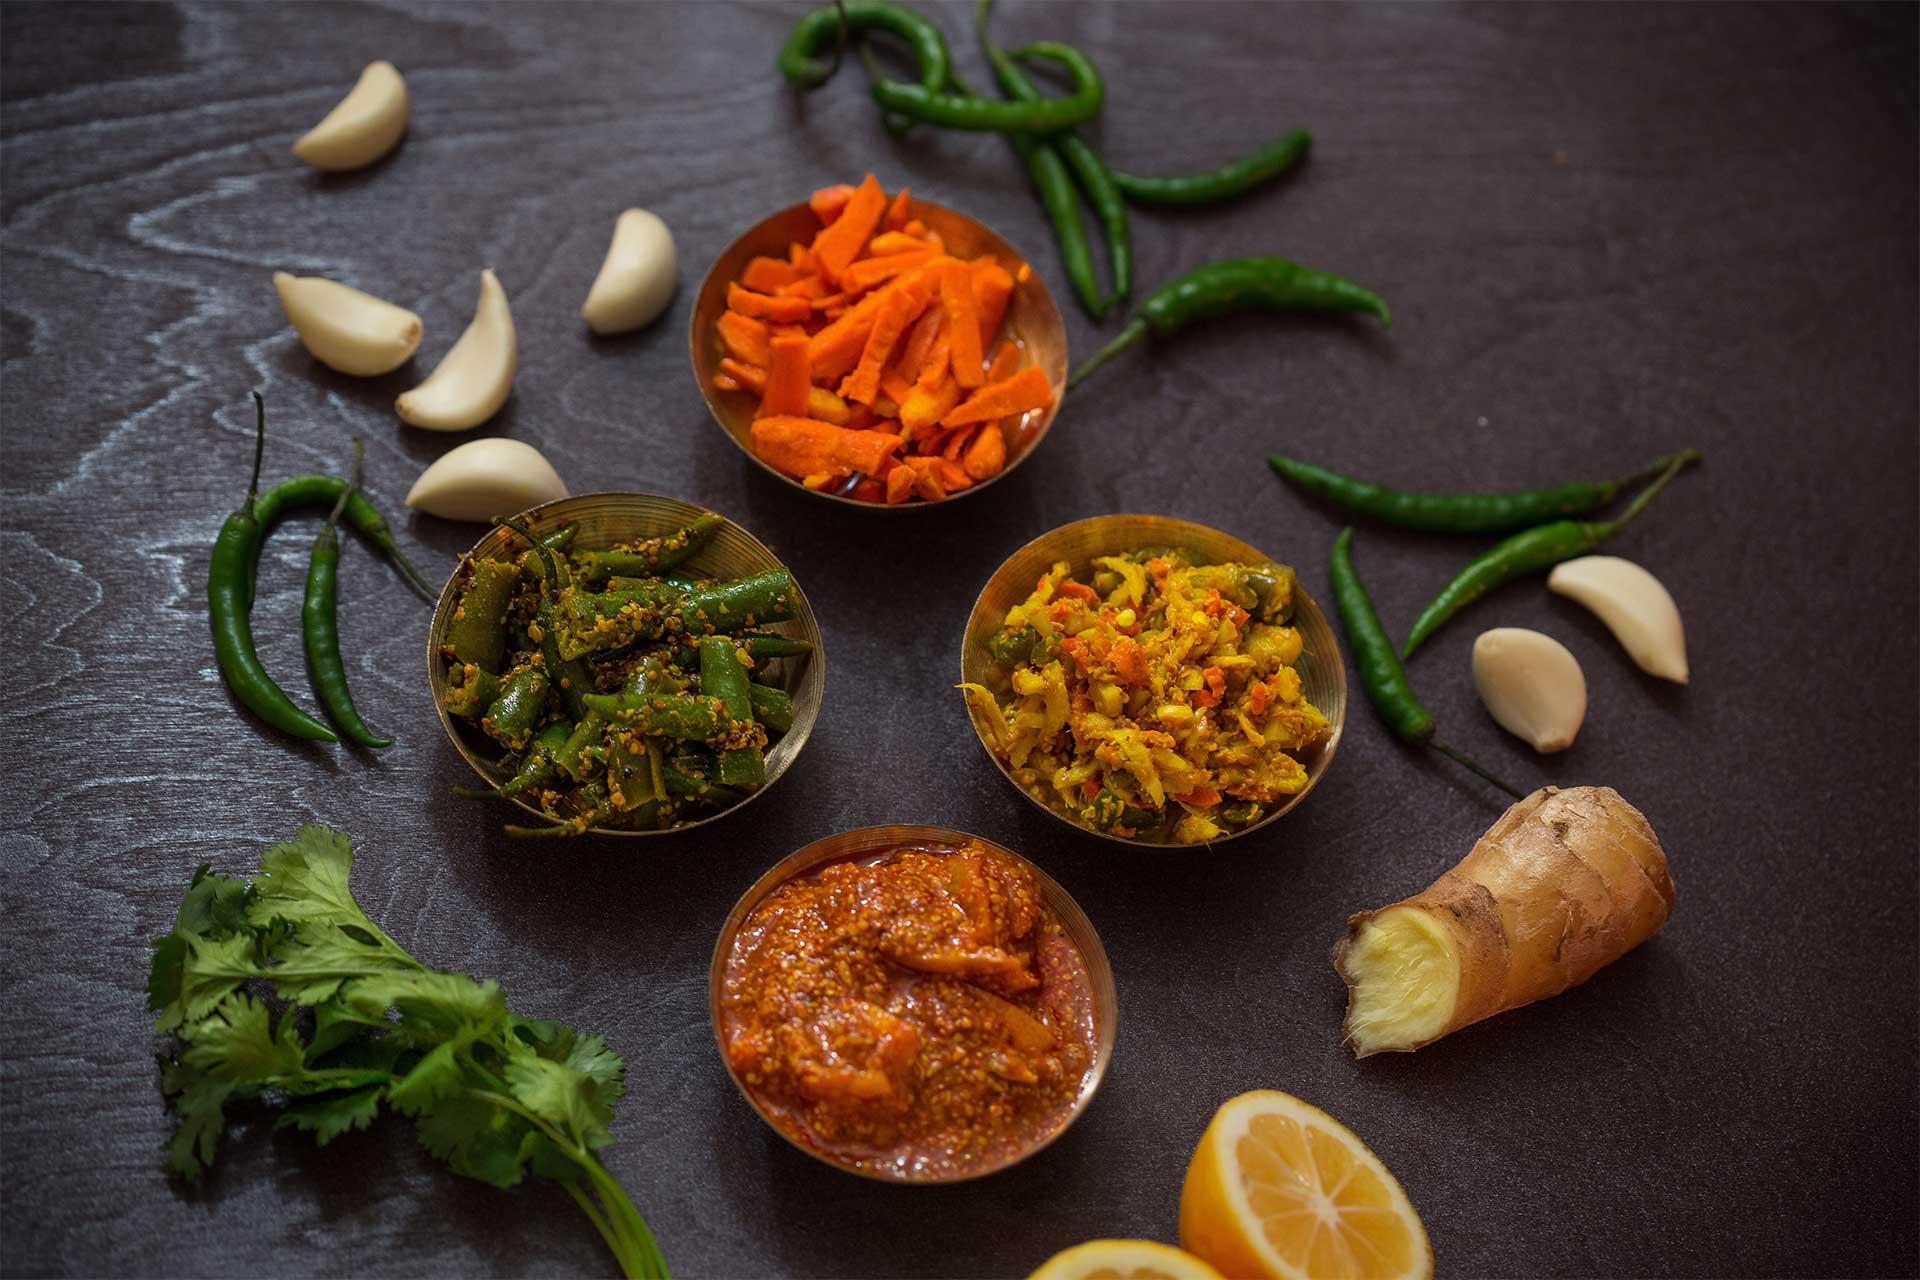 vegetarian pulao recipe, veg pulao recipe, how to make pickles, lemon pickle recipe, garlic pickle recipe, turmeric pickle recipe, green chilli pickle recipe, indian food, easy recipes, indianfoodblog, foodblog, how to make indian pickles